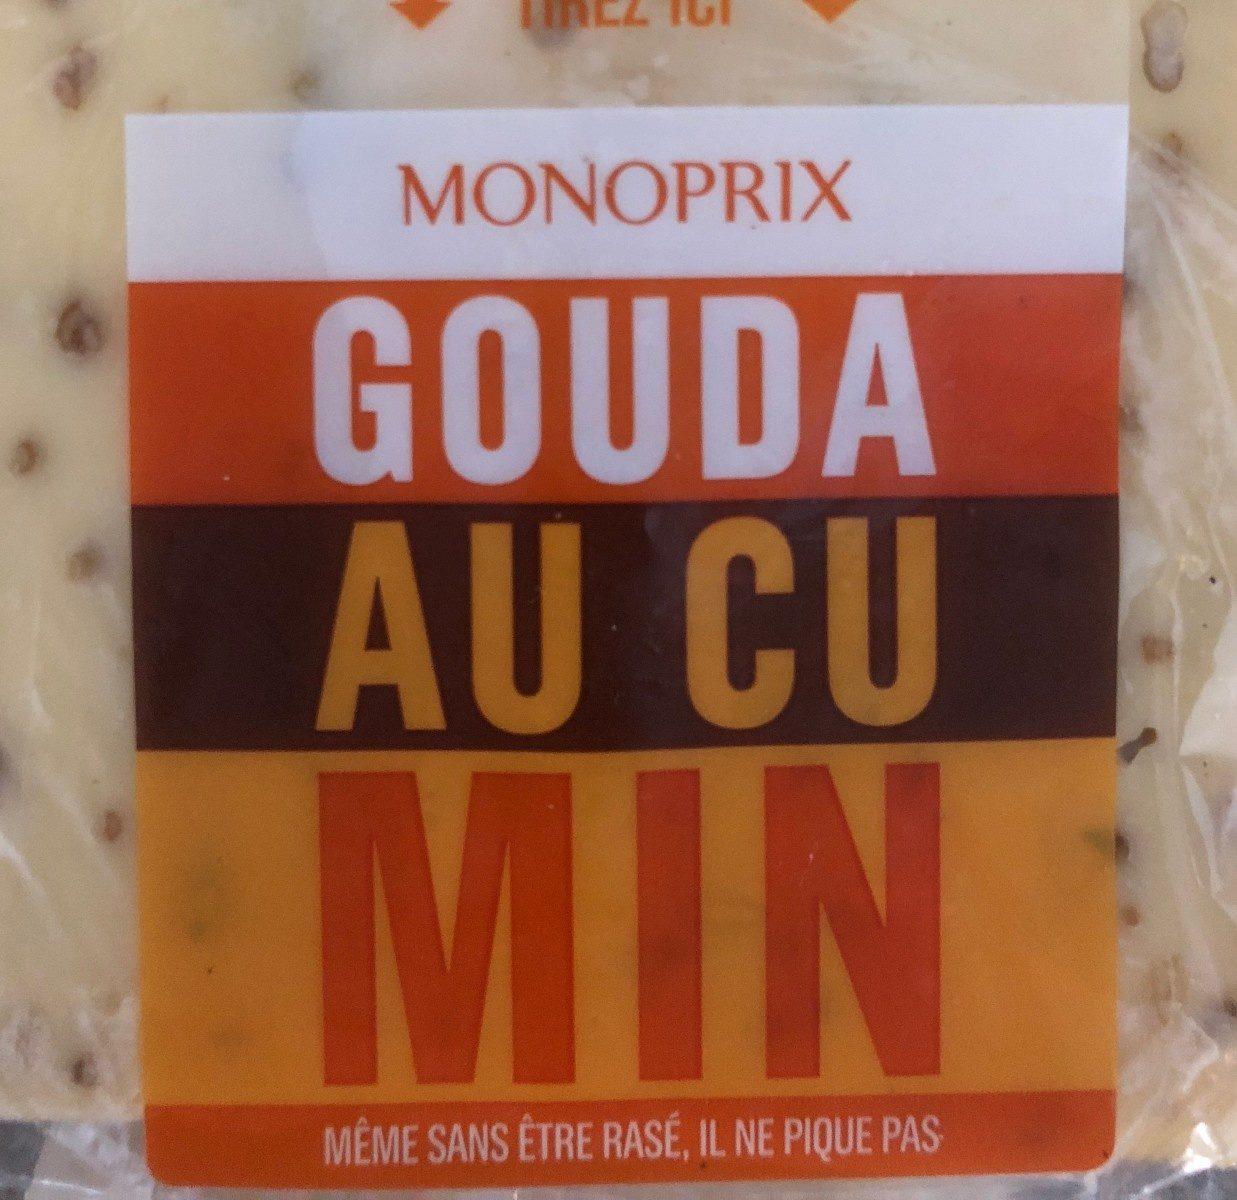 Gouda au cumin - Produit - fr